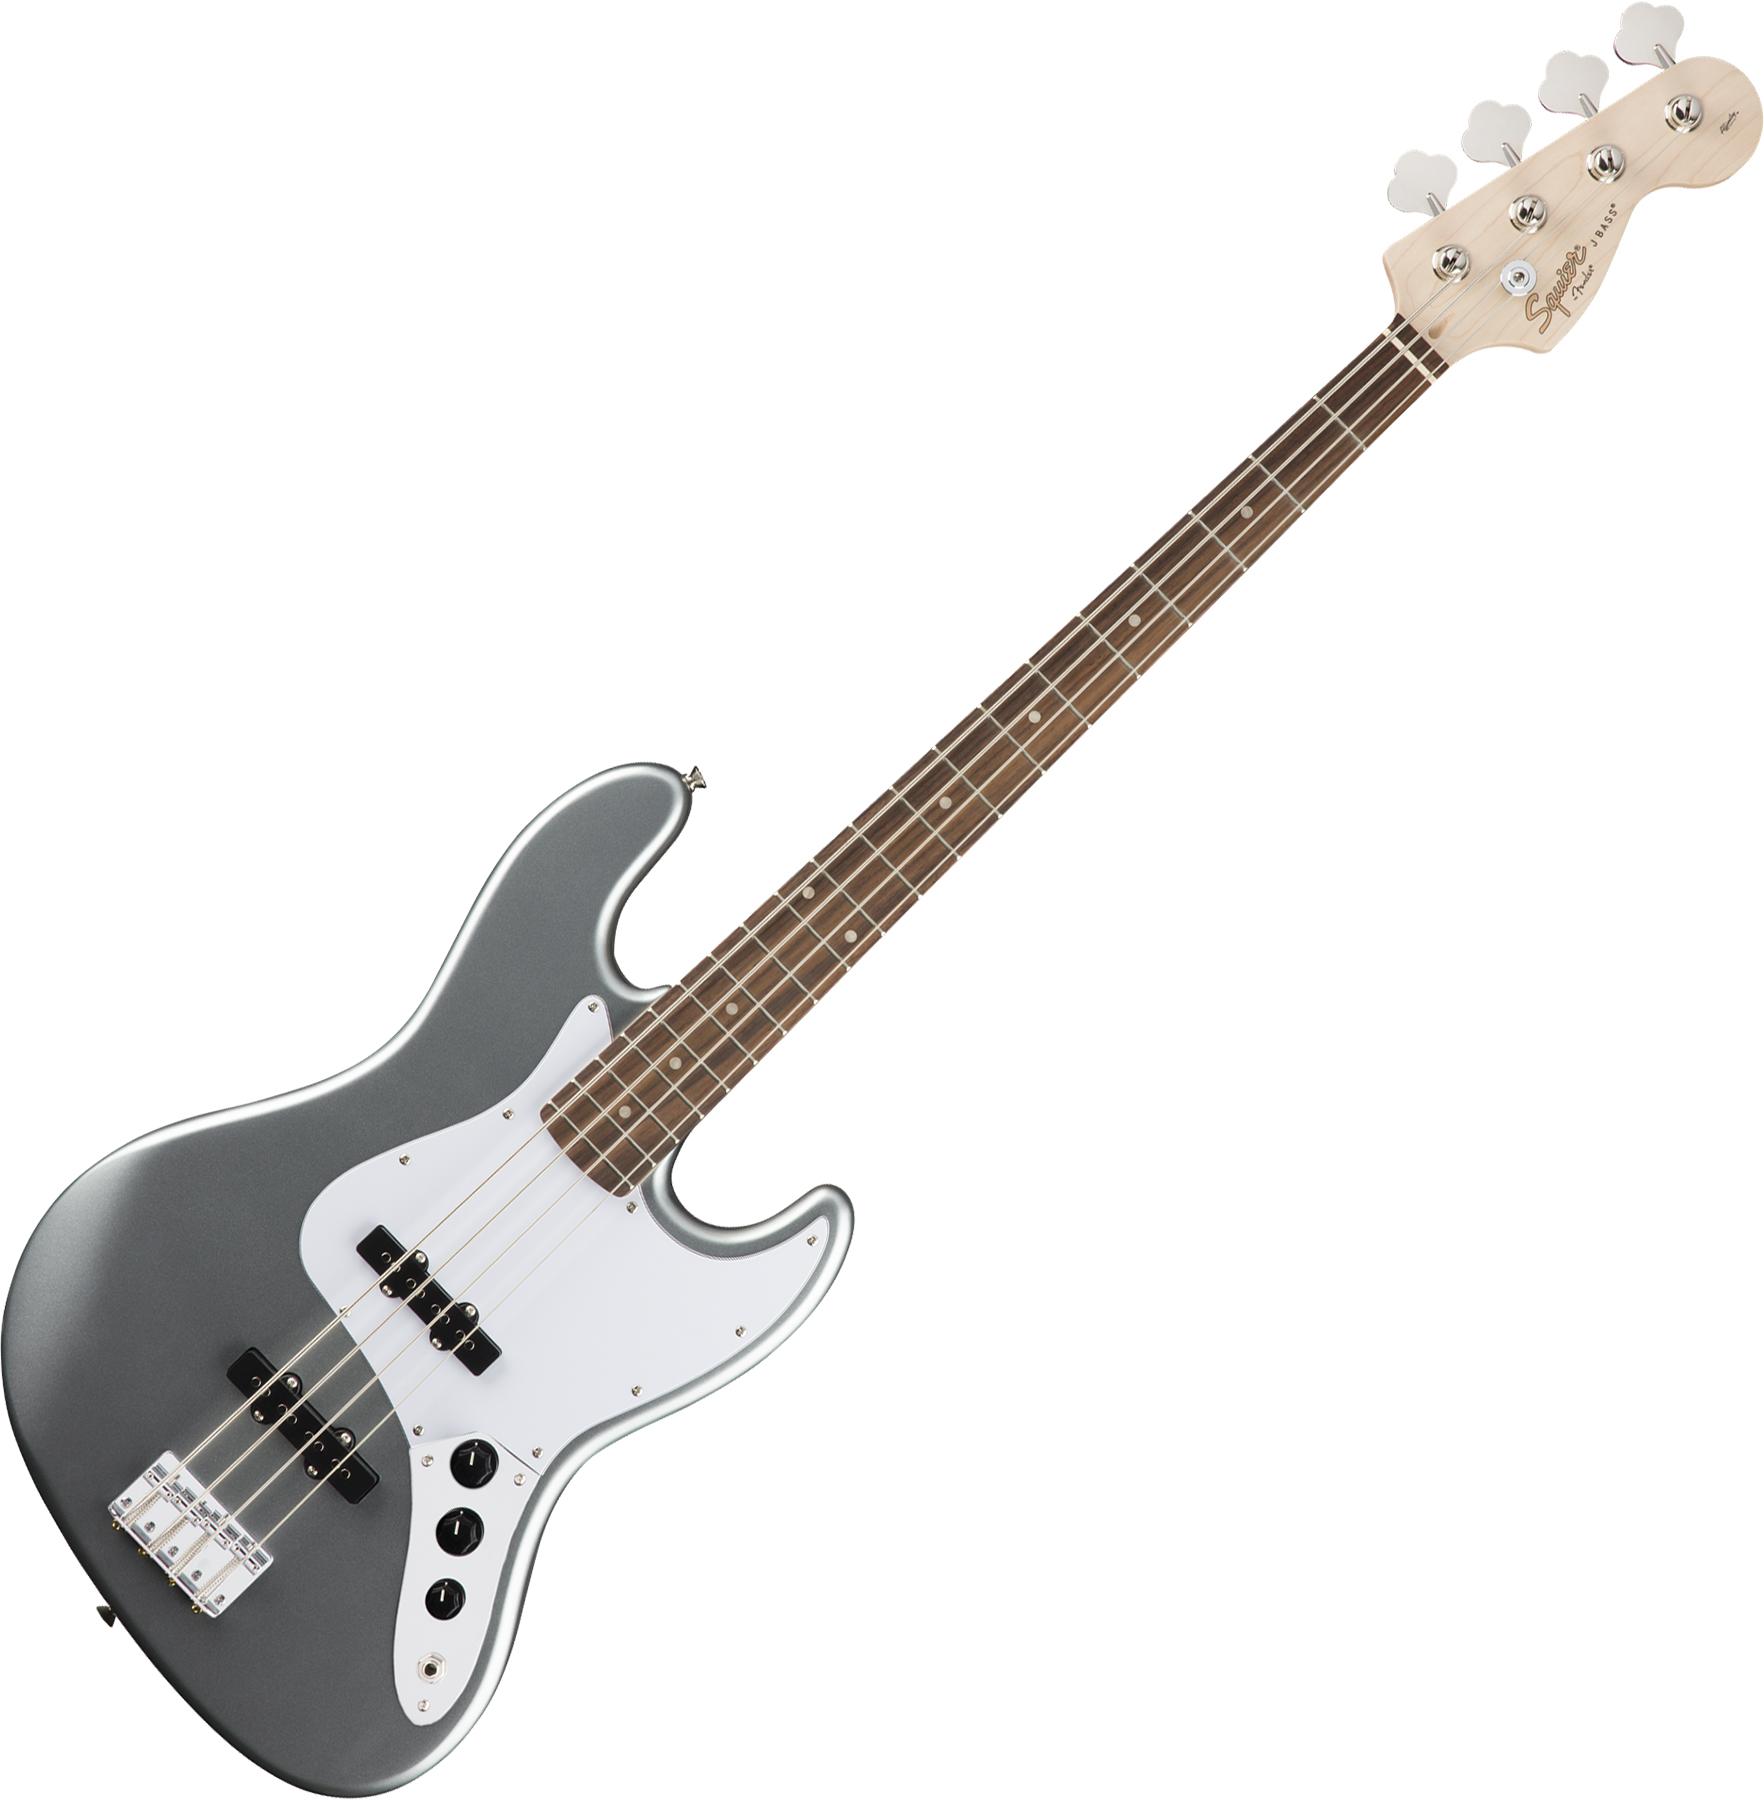 Jazz Bass Guitar Slick